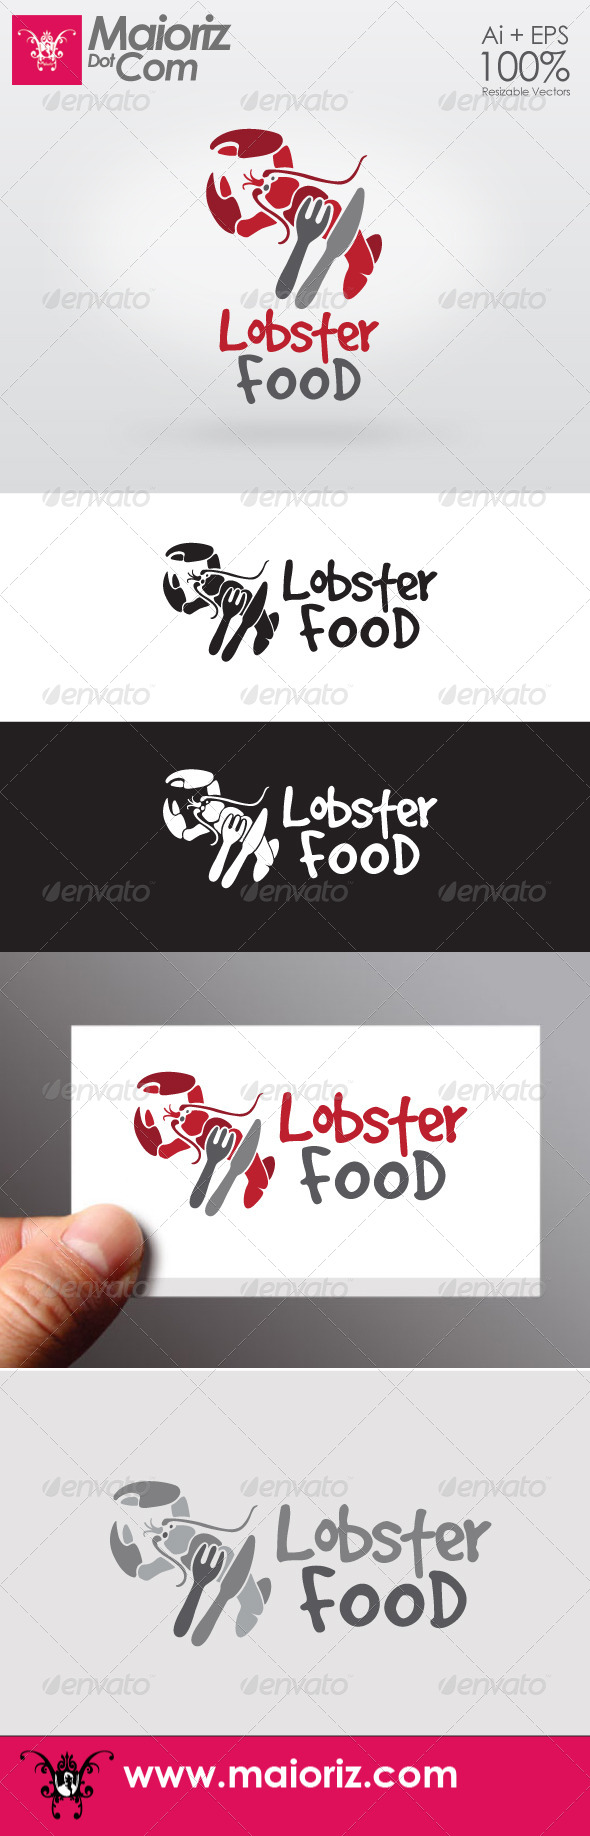 Lobster Food Logo